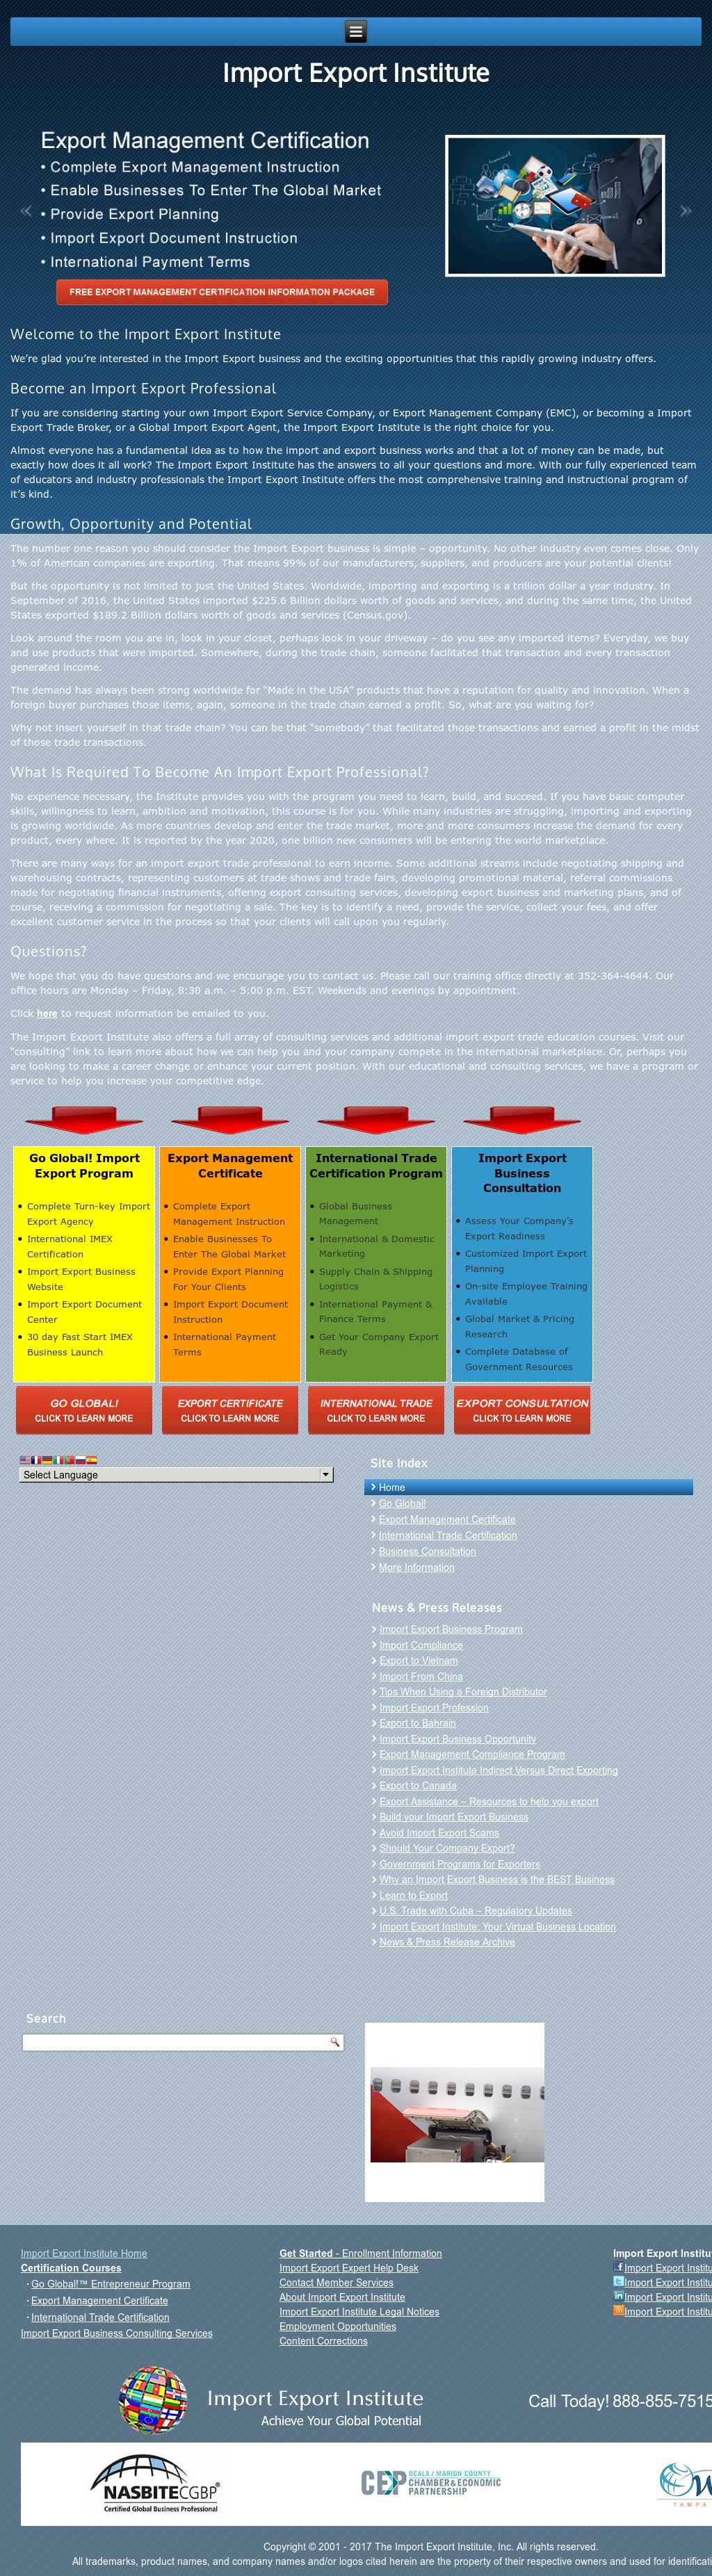 Import Export Institute Competitors, Revenue and Employees